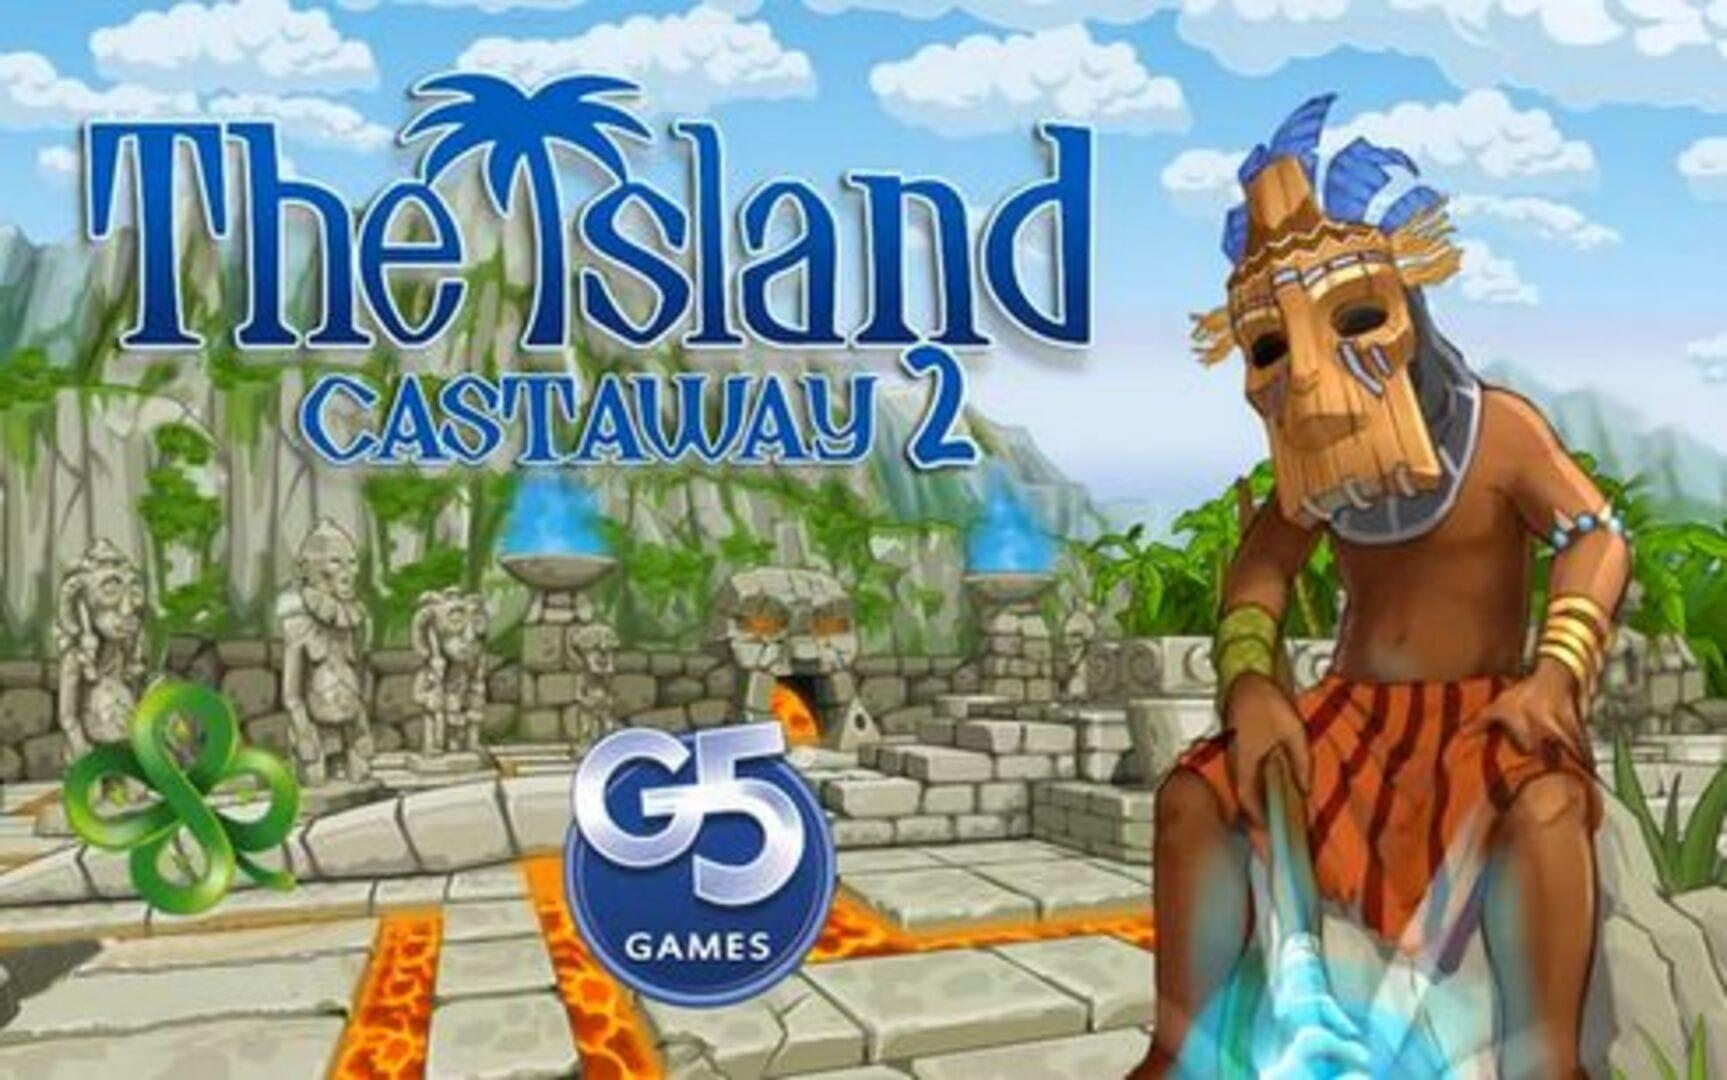 buy The Island Castaway 2 cd key for all platform